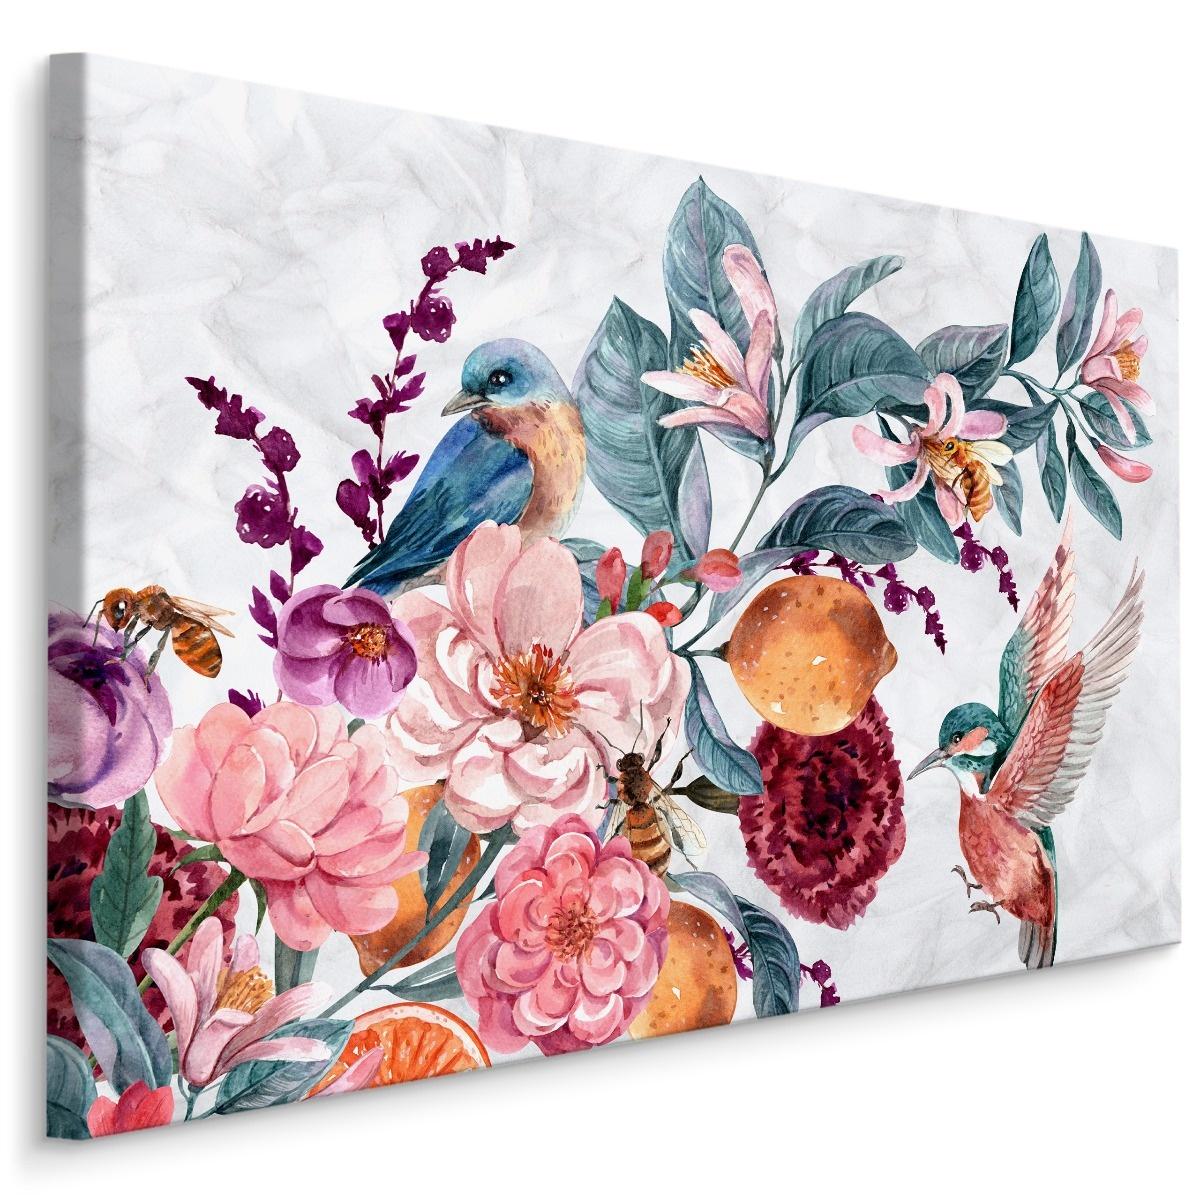 Schilderij - Bloemen en Kolibrie in Aquarel II (print op canvas), multi-gekleurd, 4 maten, wanddecor